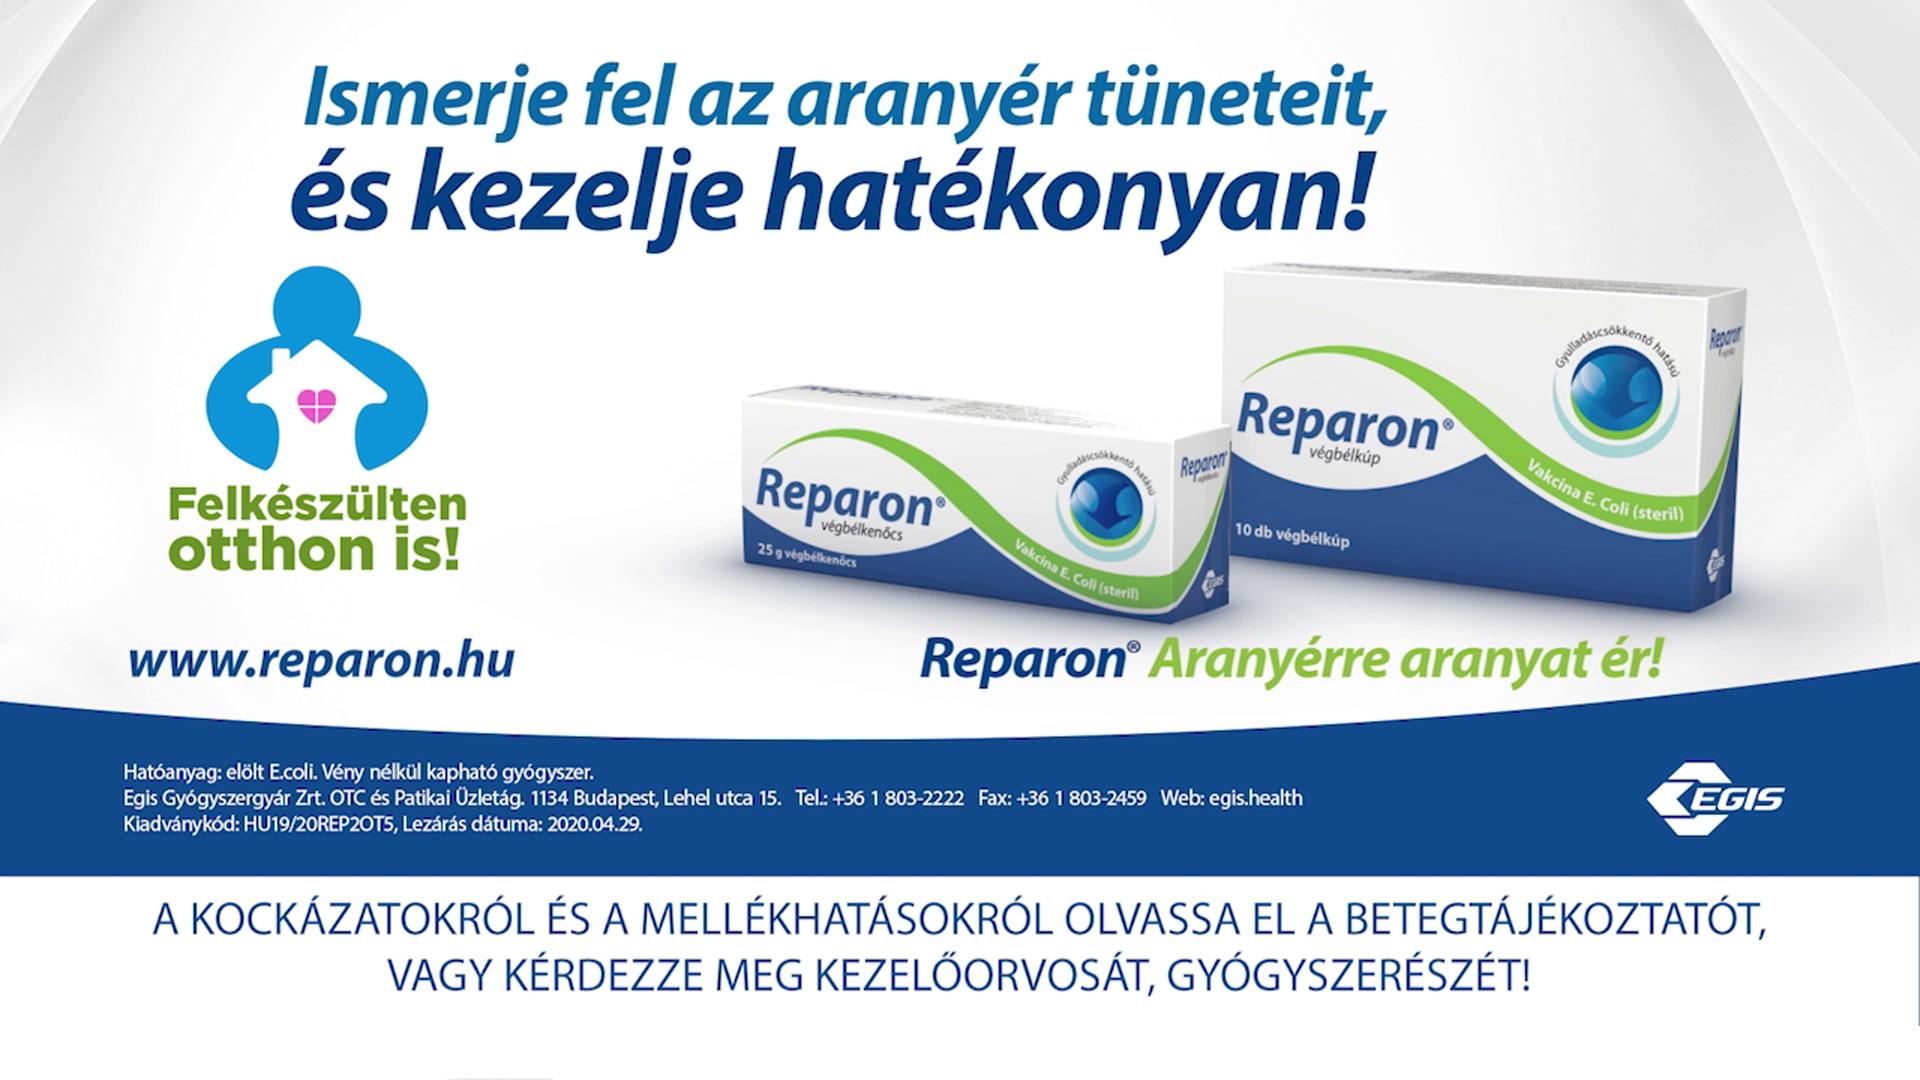 Pharmatex – hormonmentes fogamzásgátlók 4-féle formában